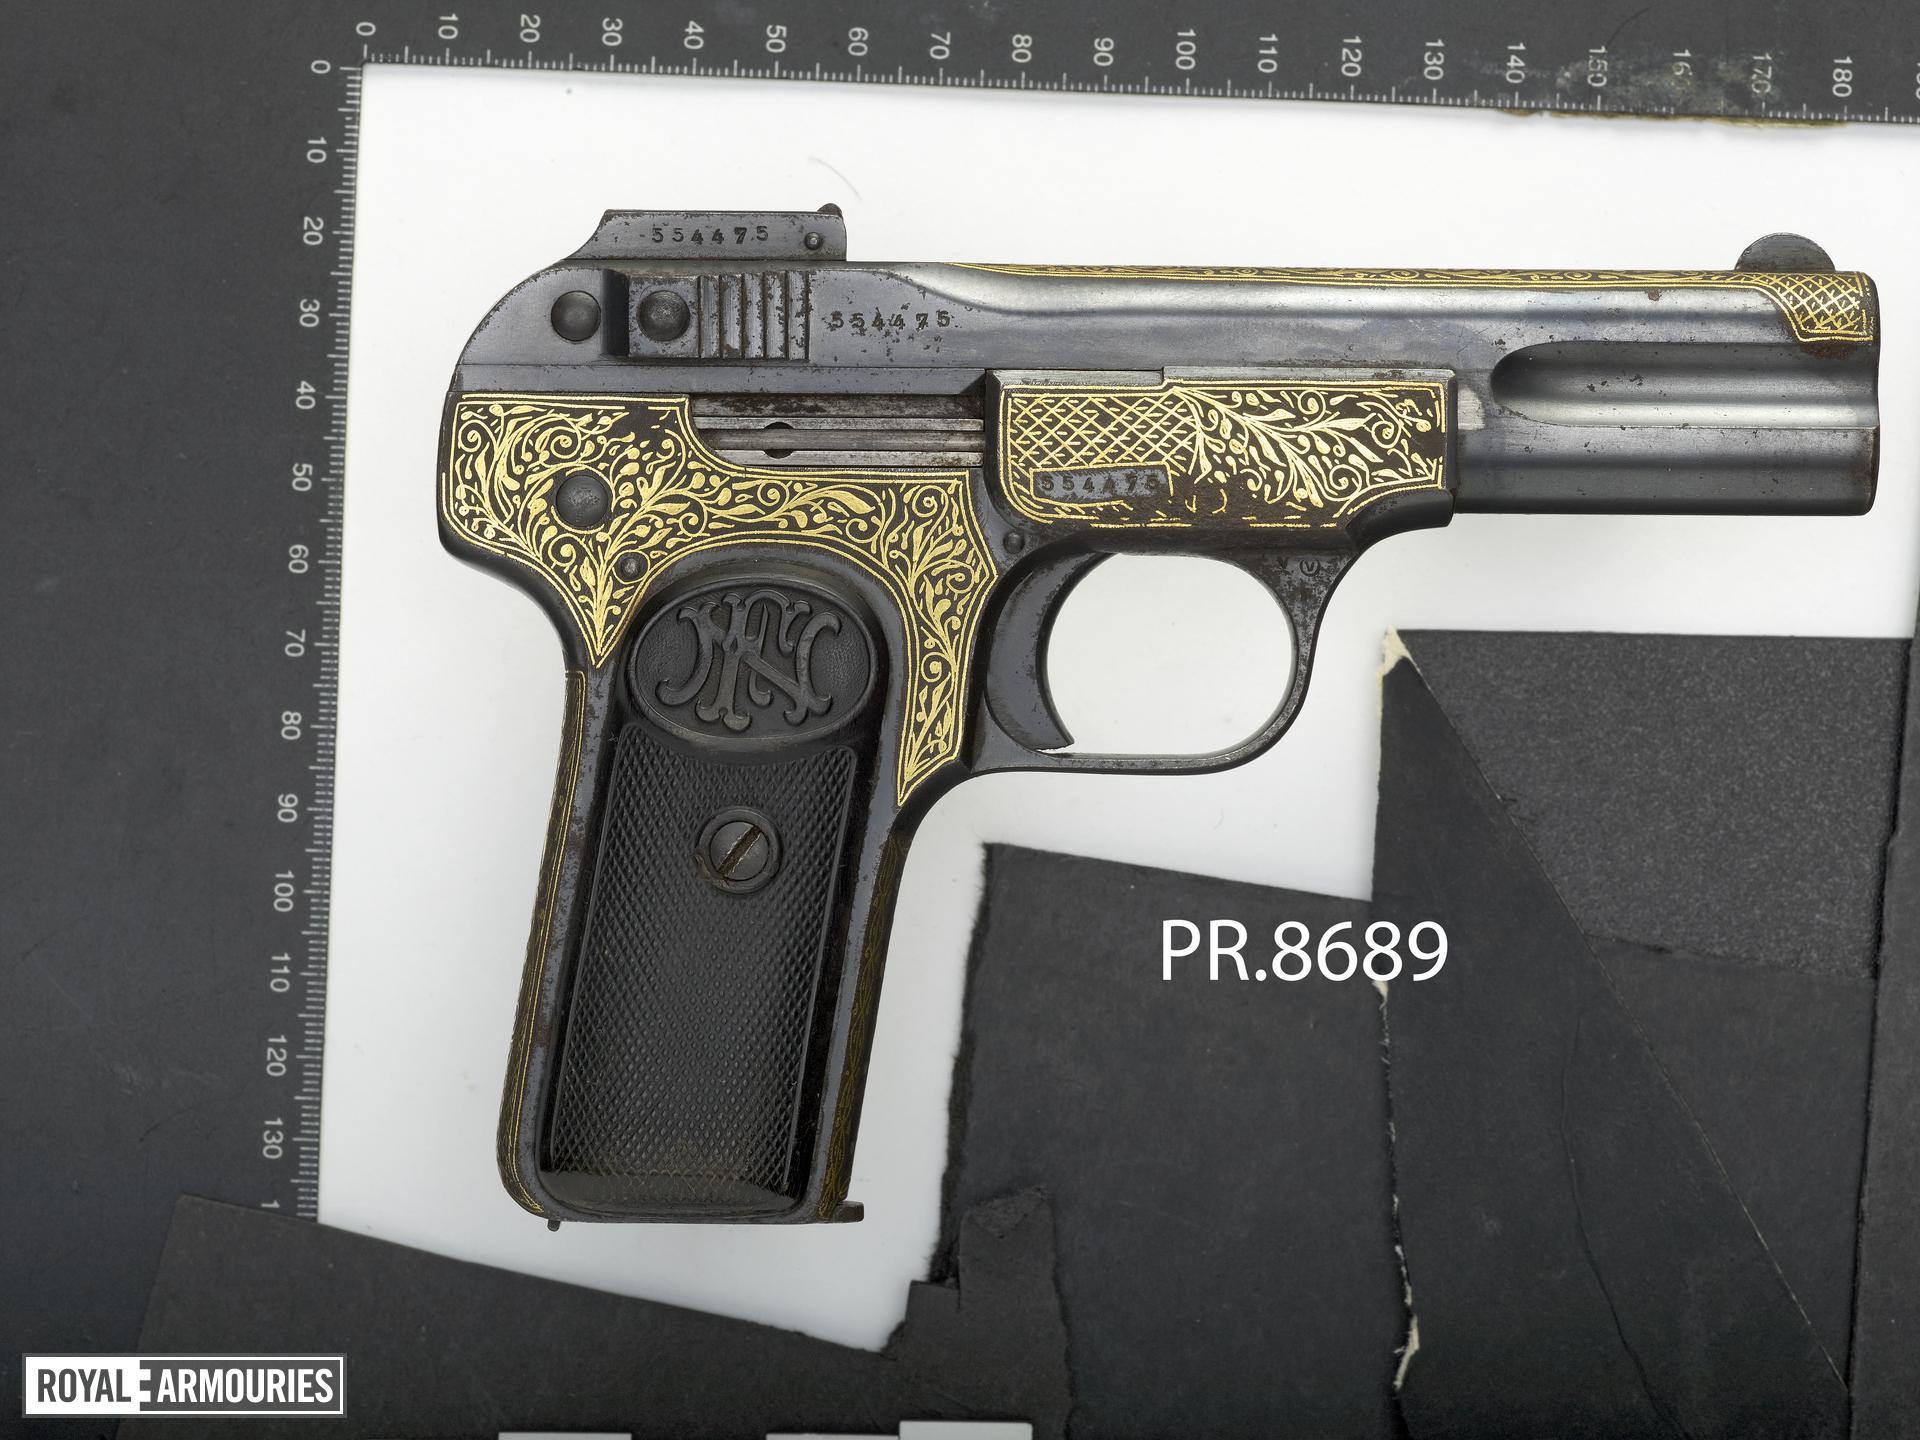 Centrefire self-loading pistol - FN Browning Model 1900 Gold engraving